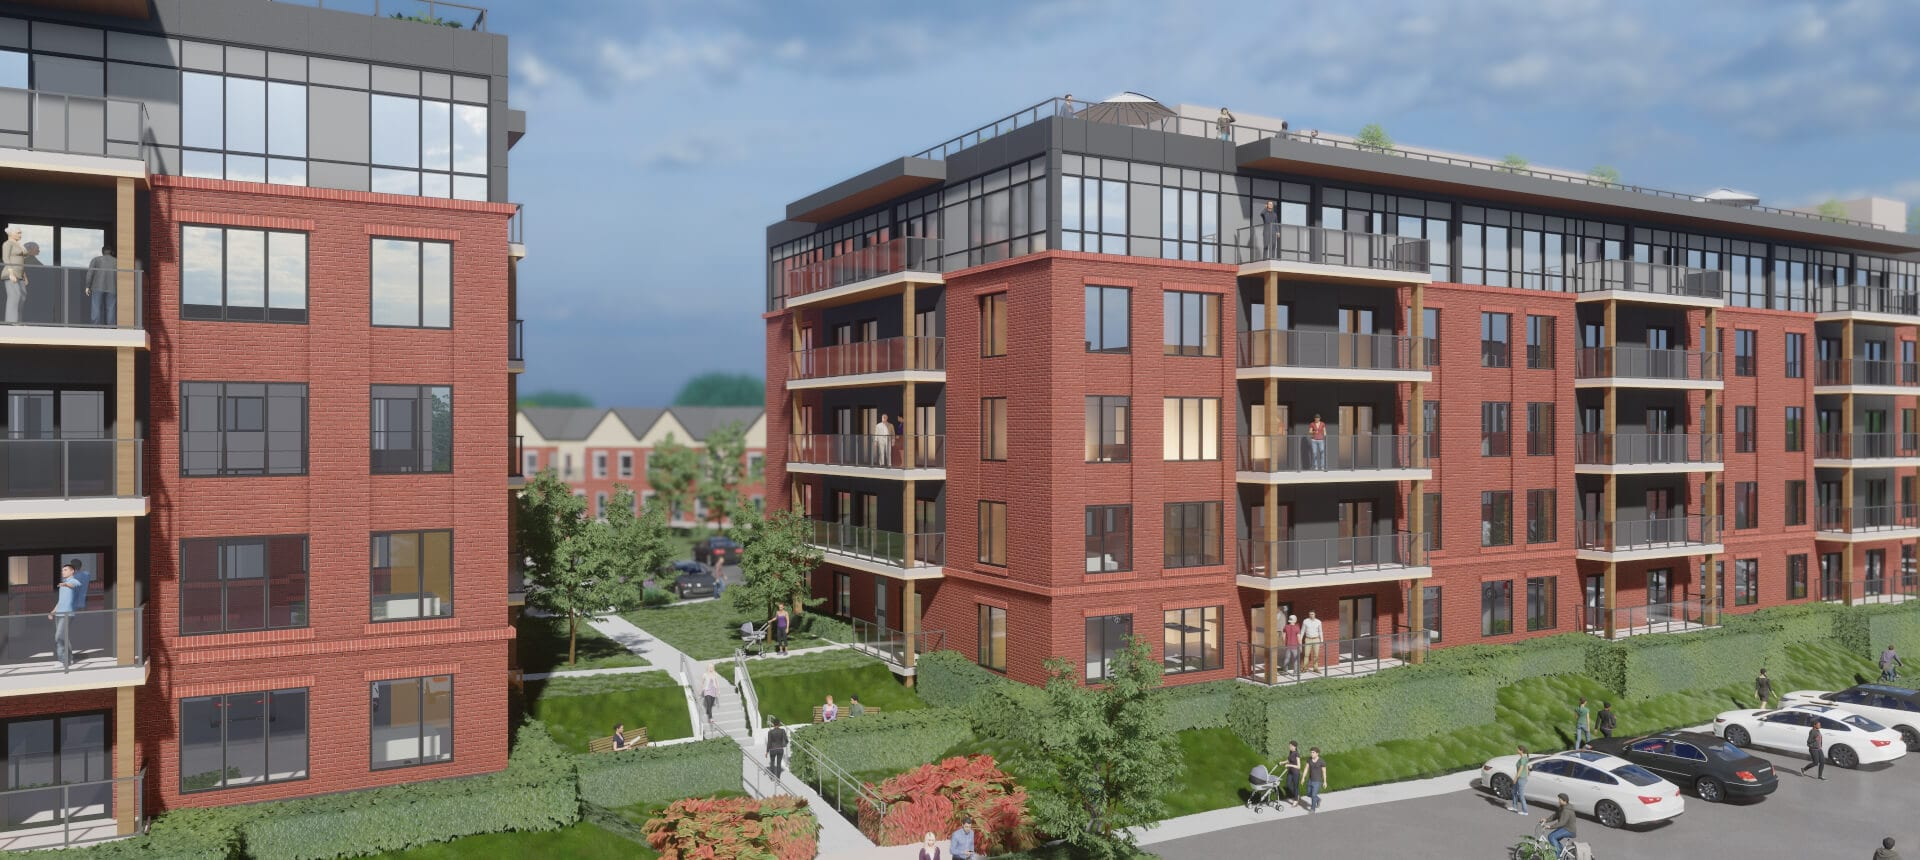 SkyDev Development Meaford - Buildings